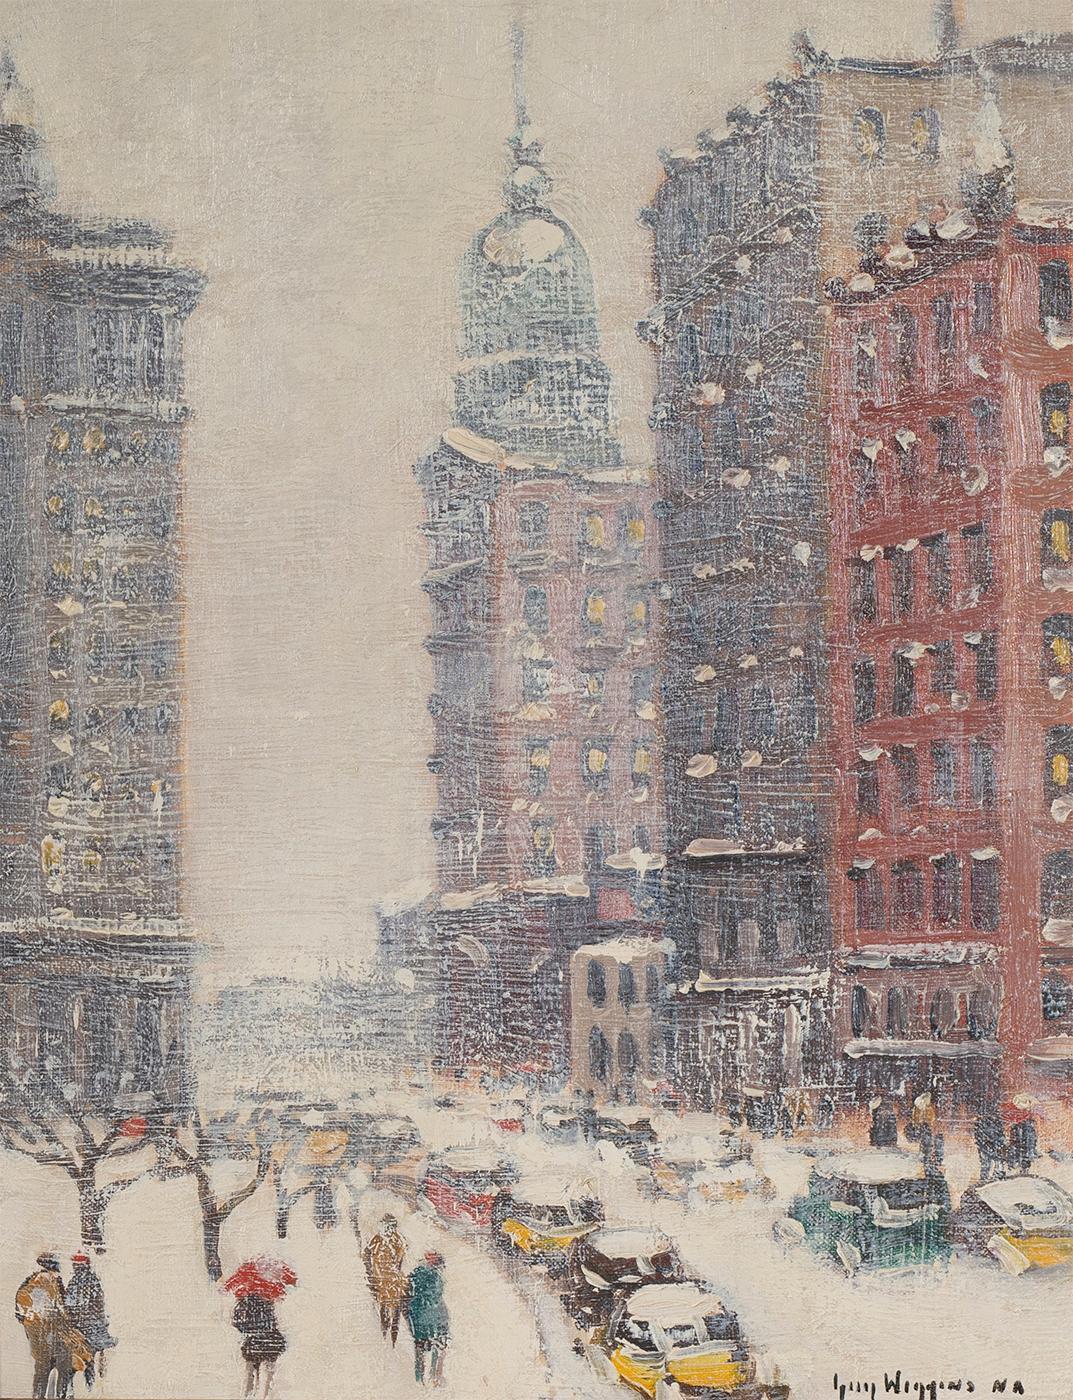 Lower New York, Winter